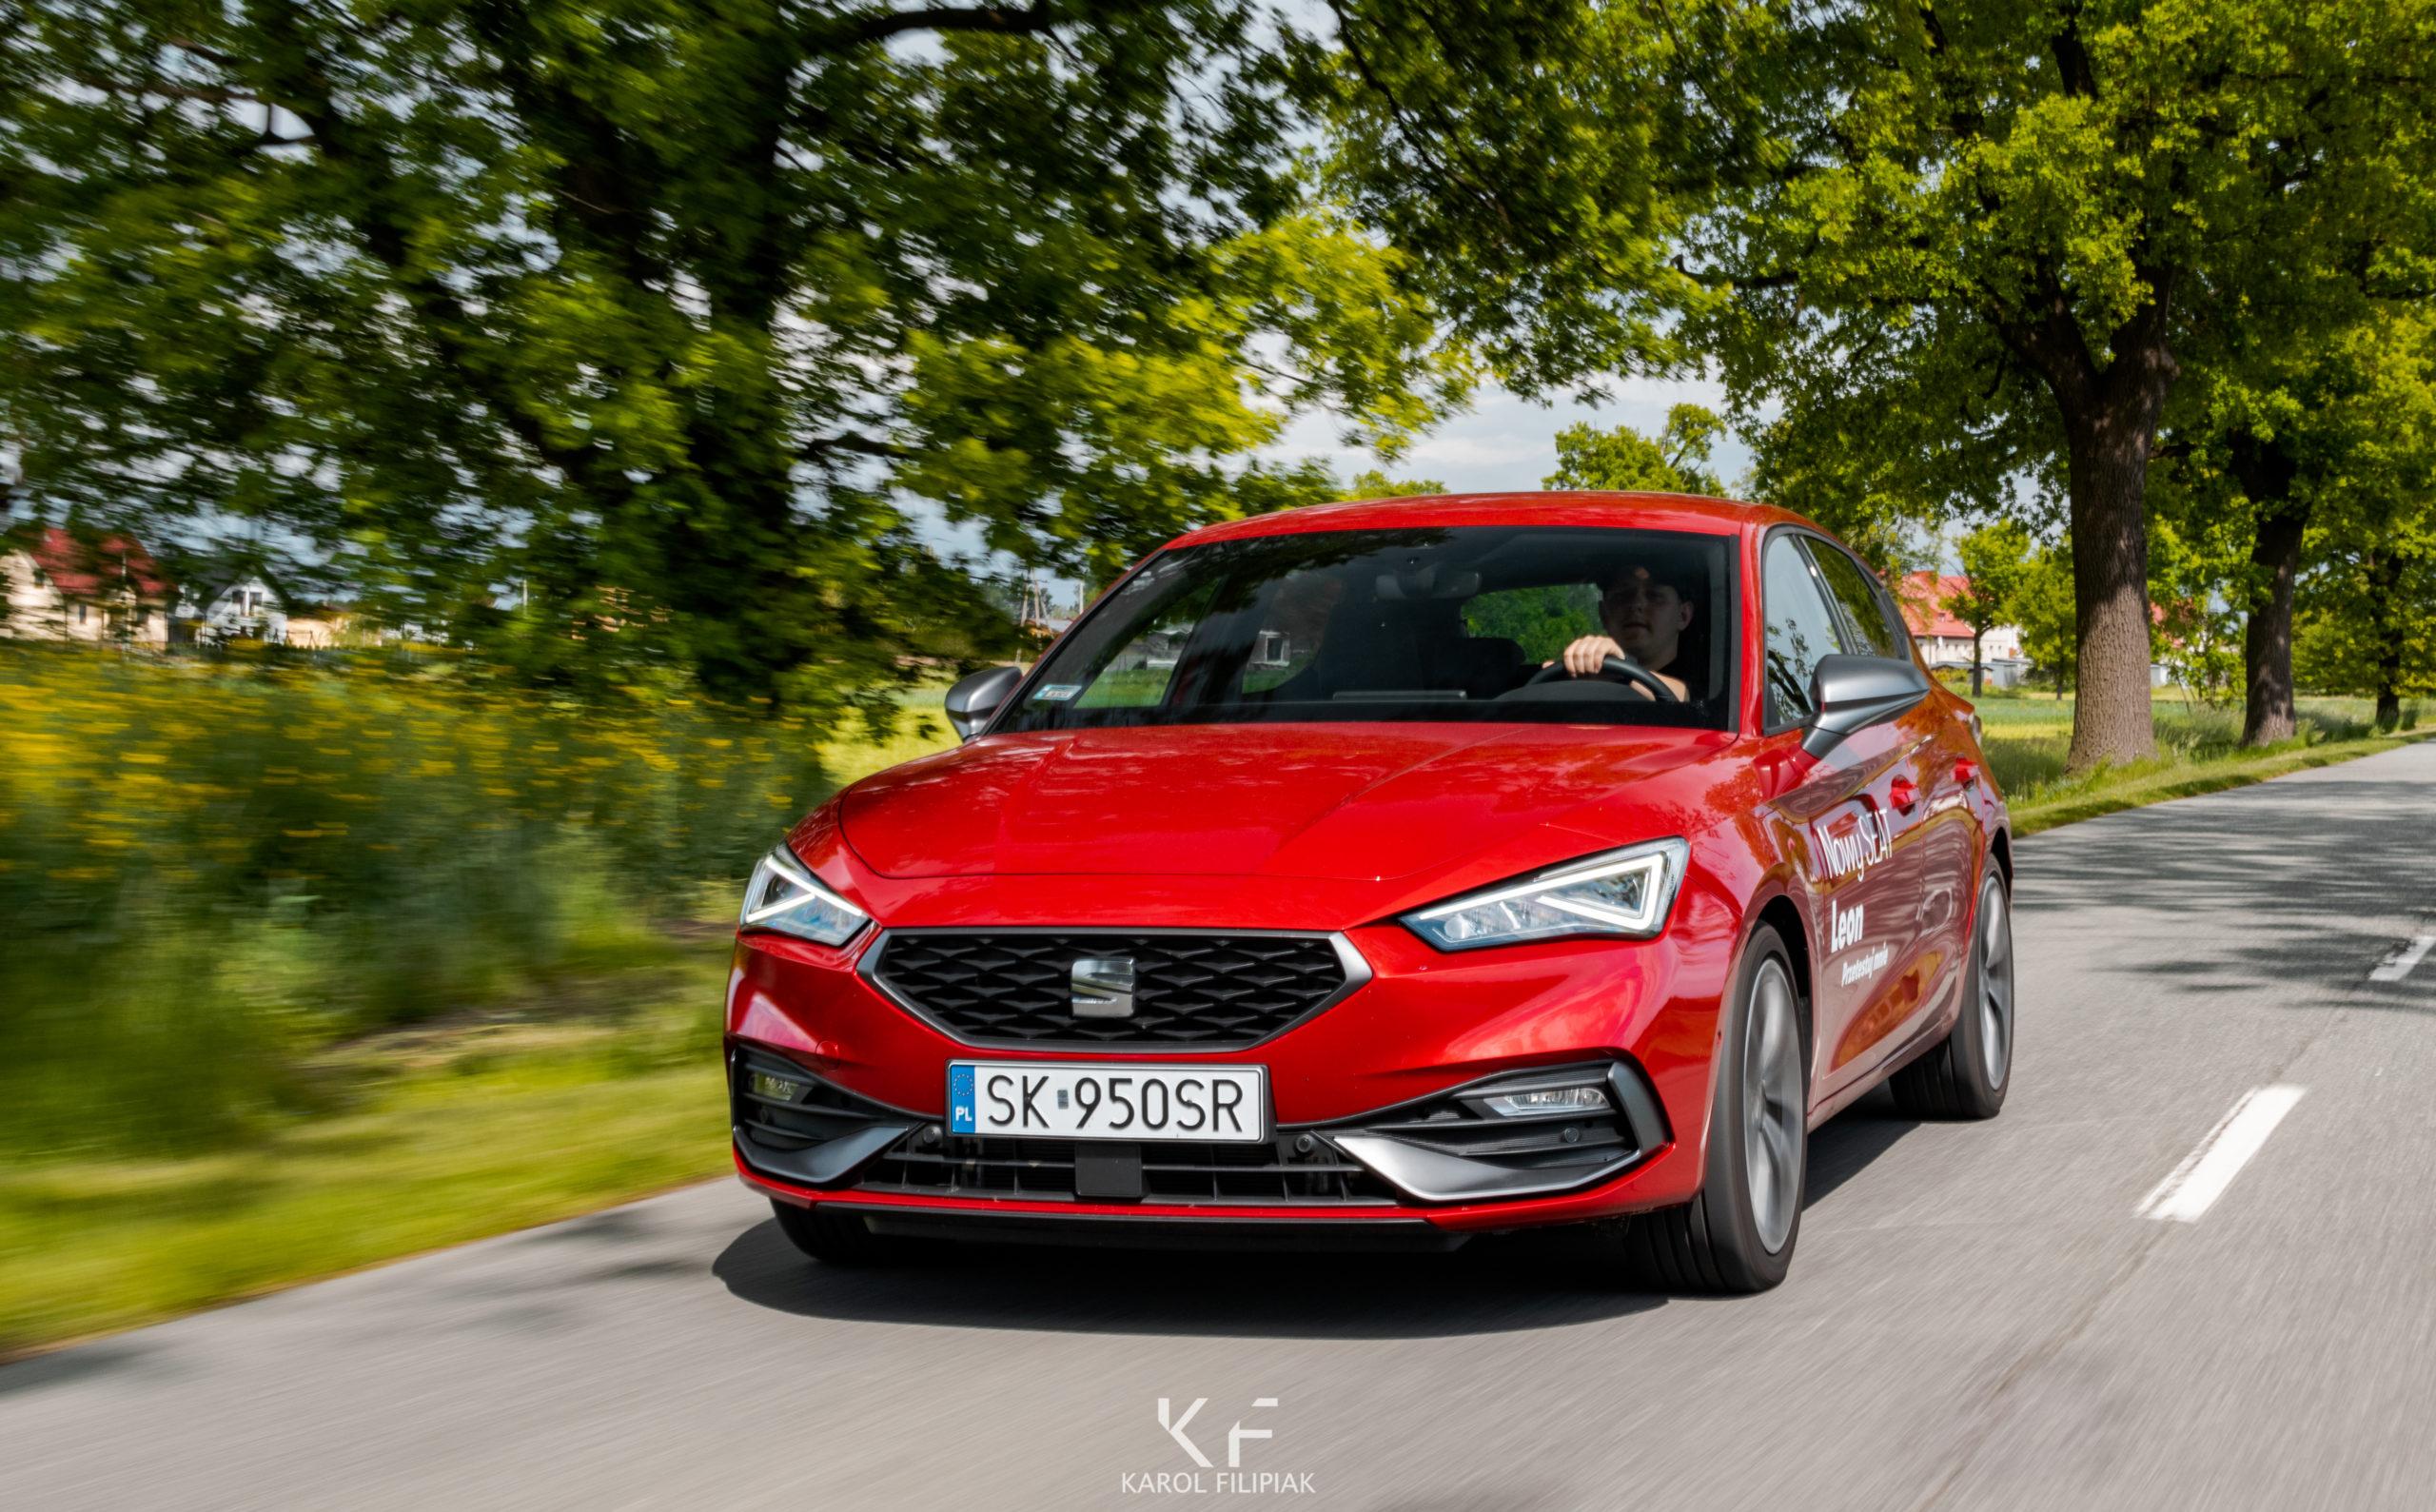 Seat Leon FR 2020 1.5 eTSI 150 KM DSG